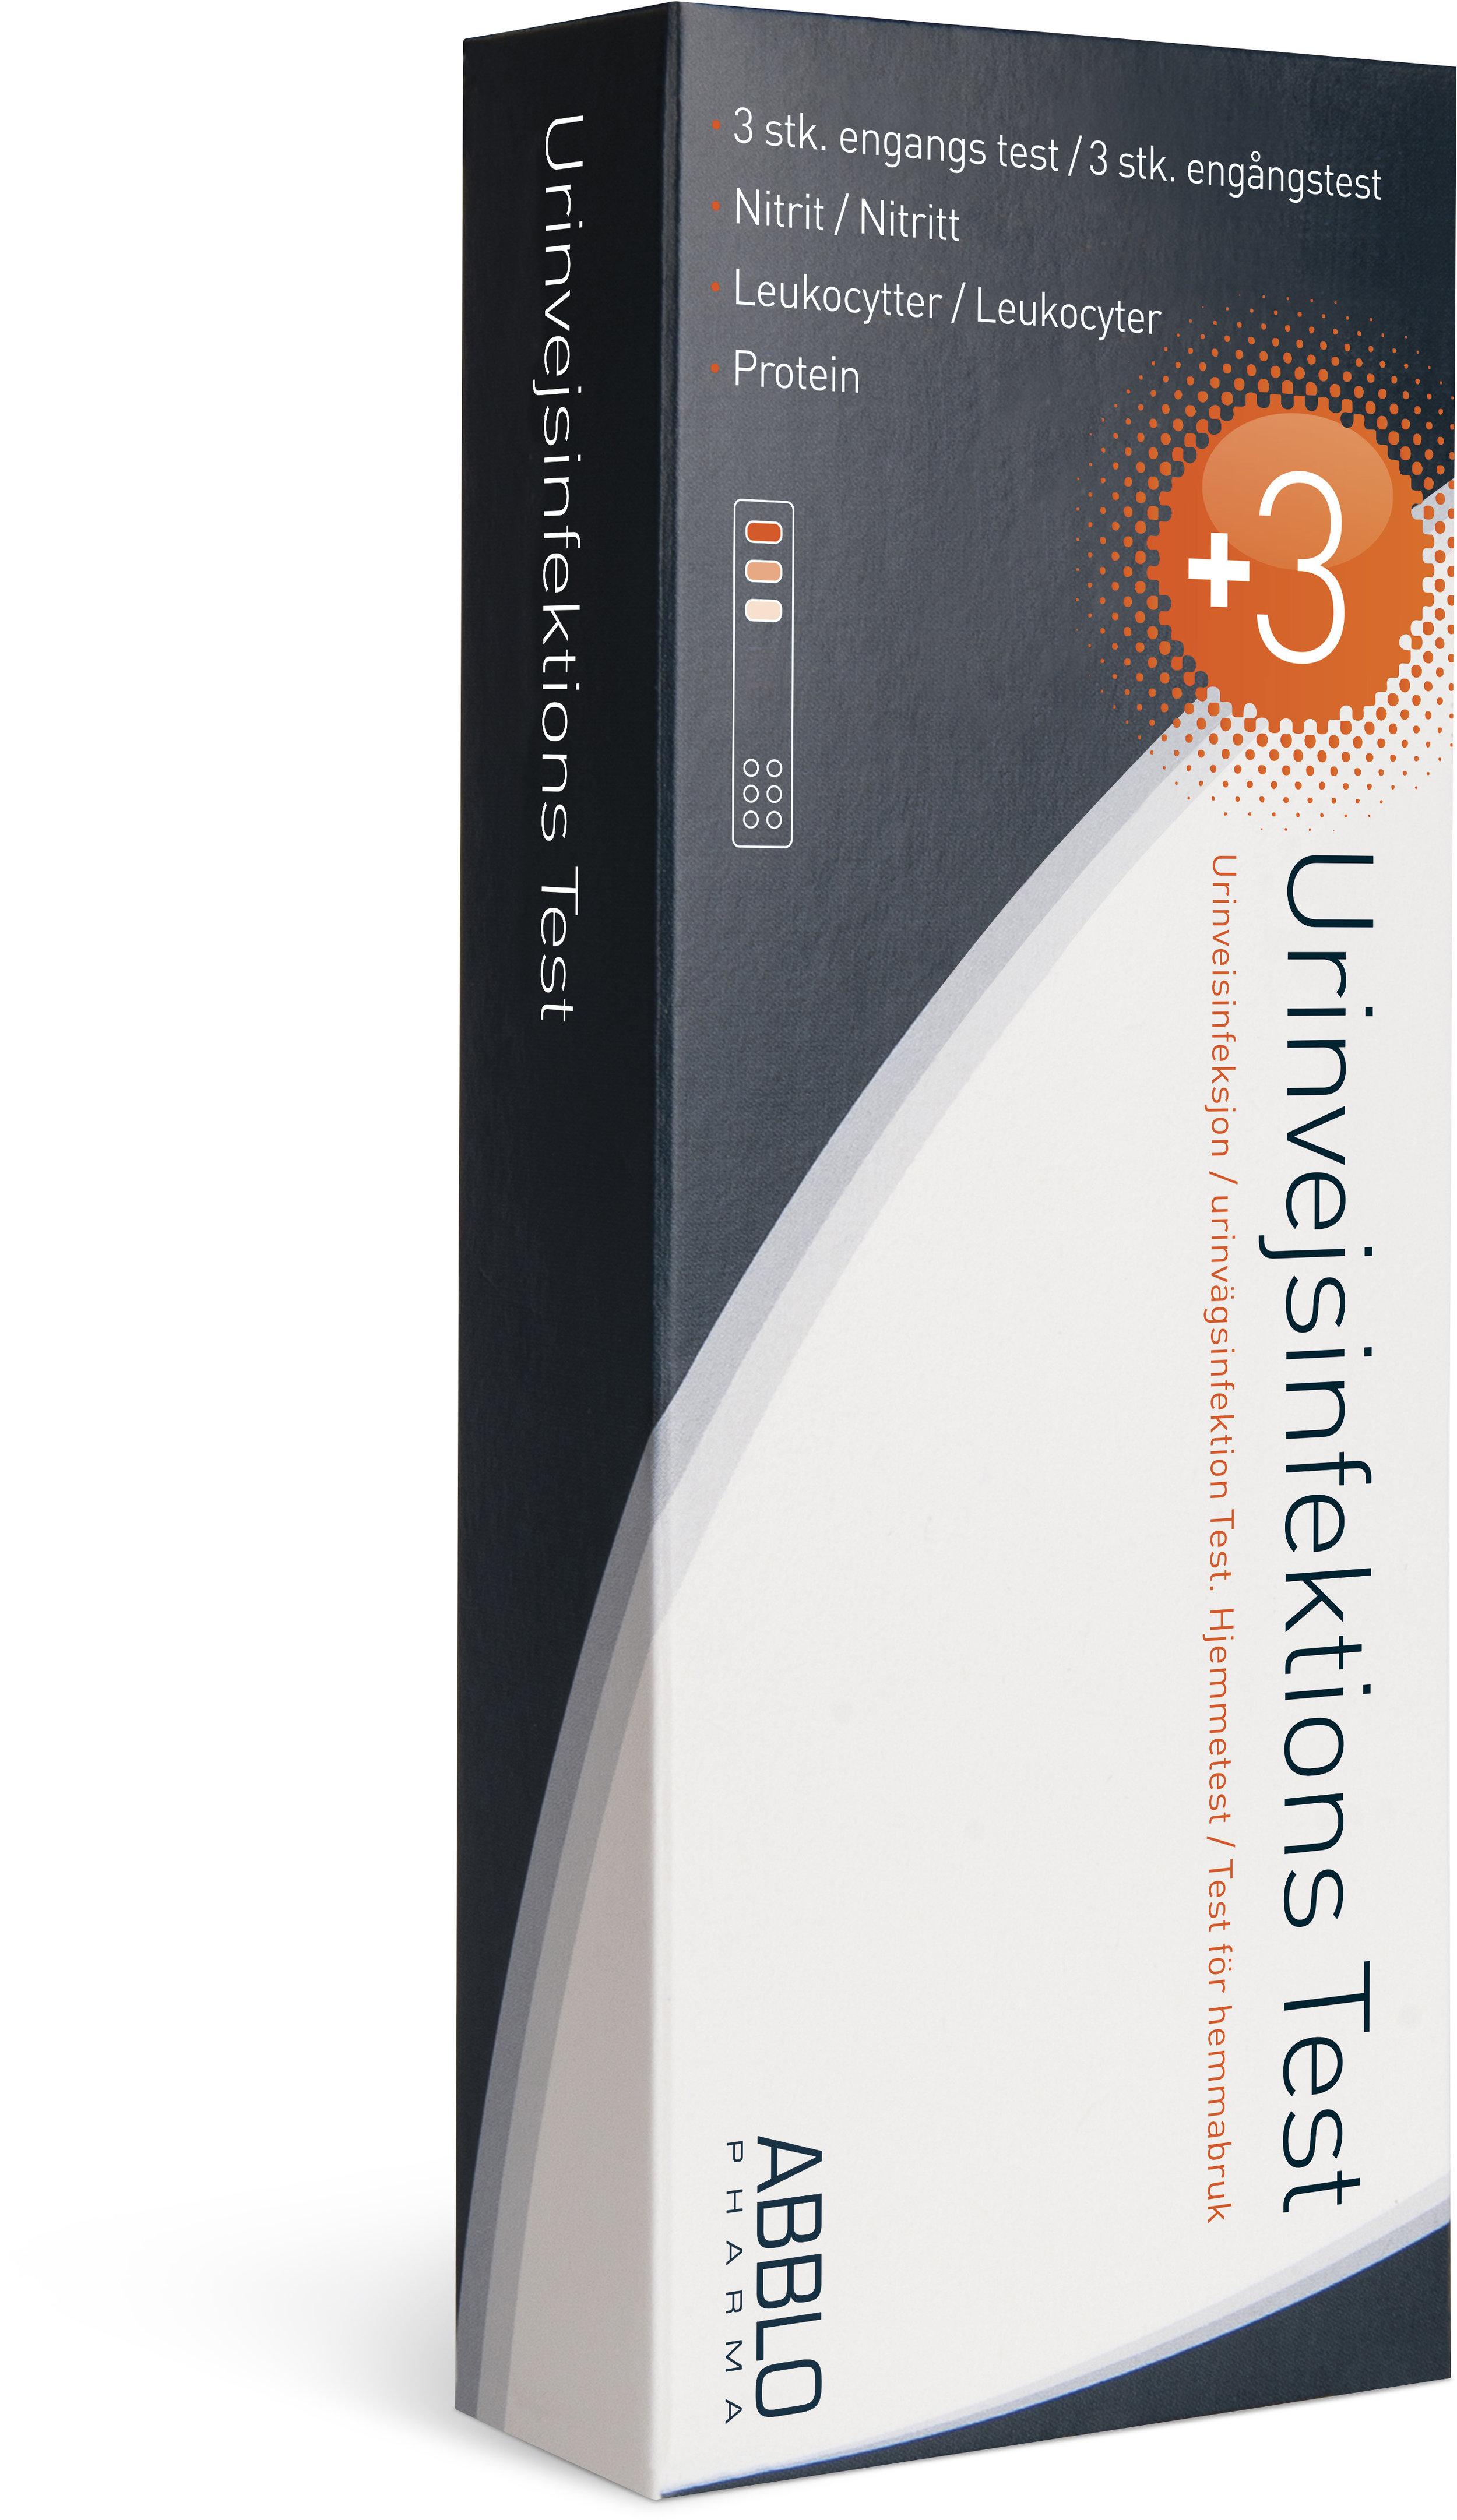 ABBLO_Pharma_urine_infection_urinvejsinfektion.jpg